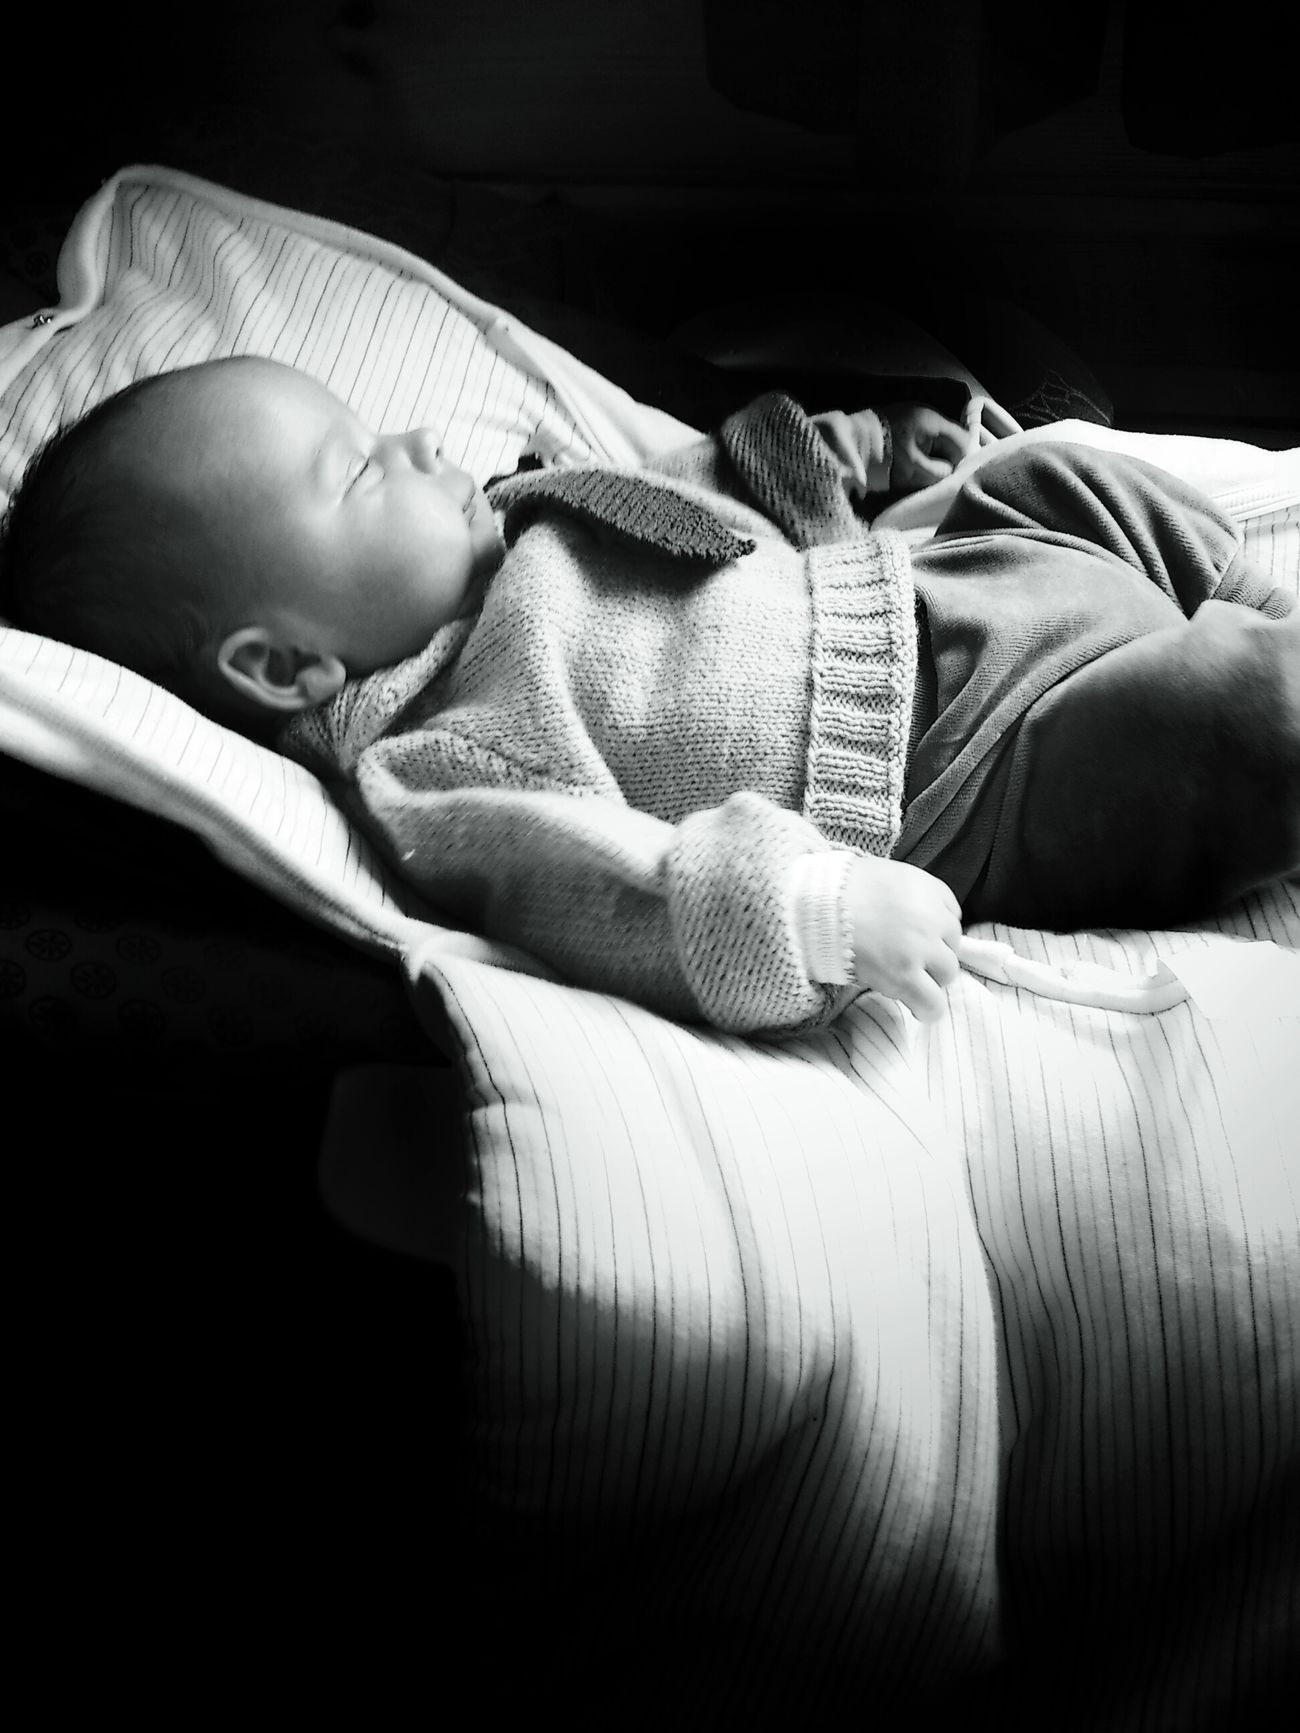 chuuutttttt!! monsieur le ministre est en séance... Shootermag Gang_family Baby Monochrome